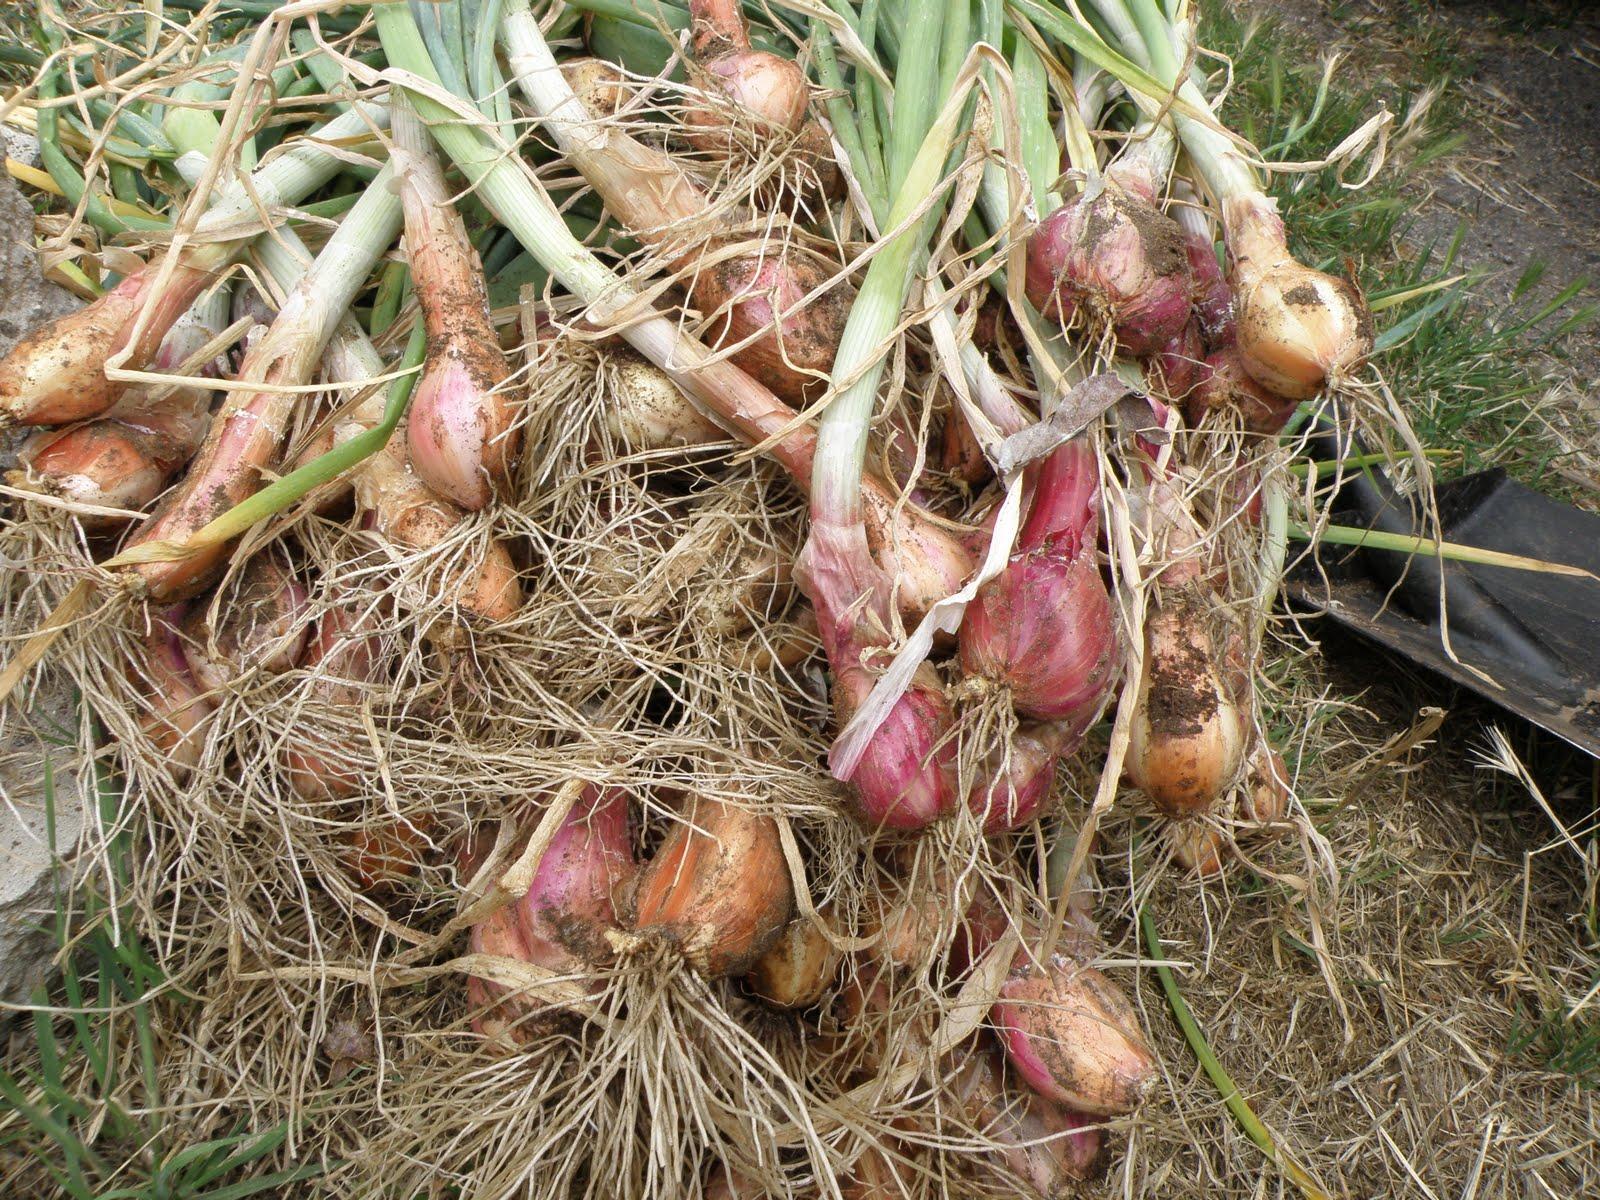 A Thinking Stomach: Shallots and Potato Onions